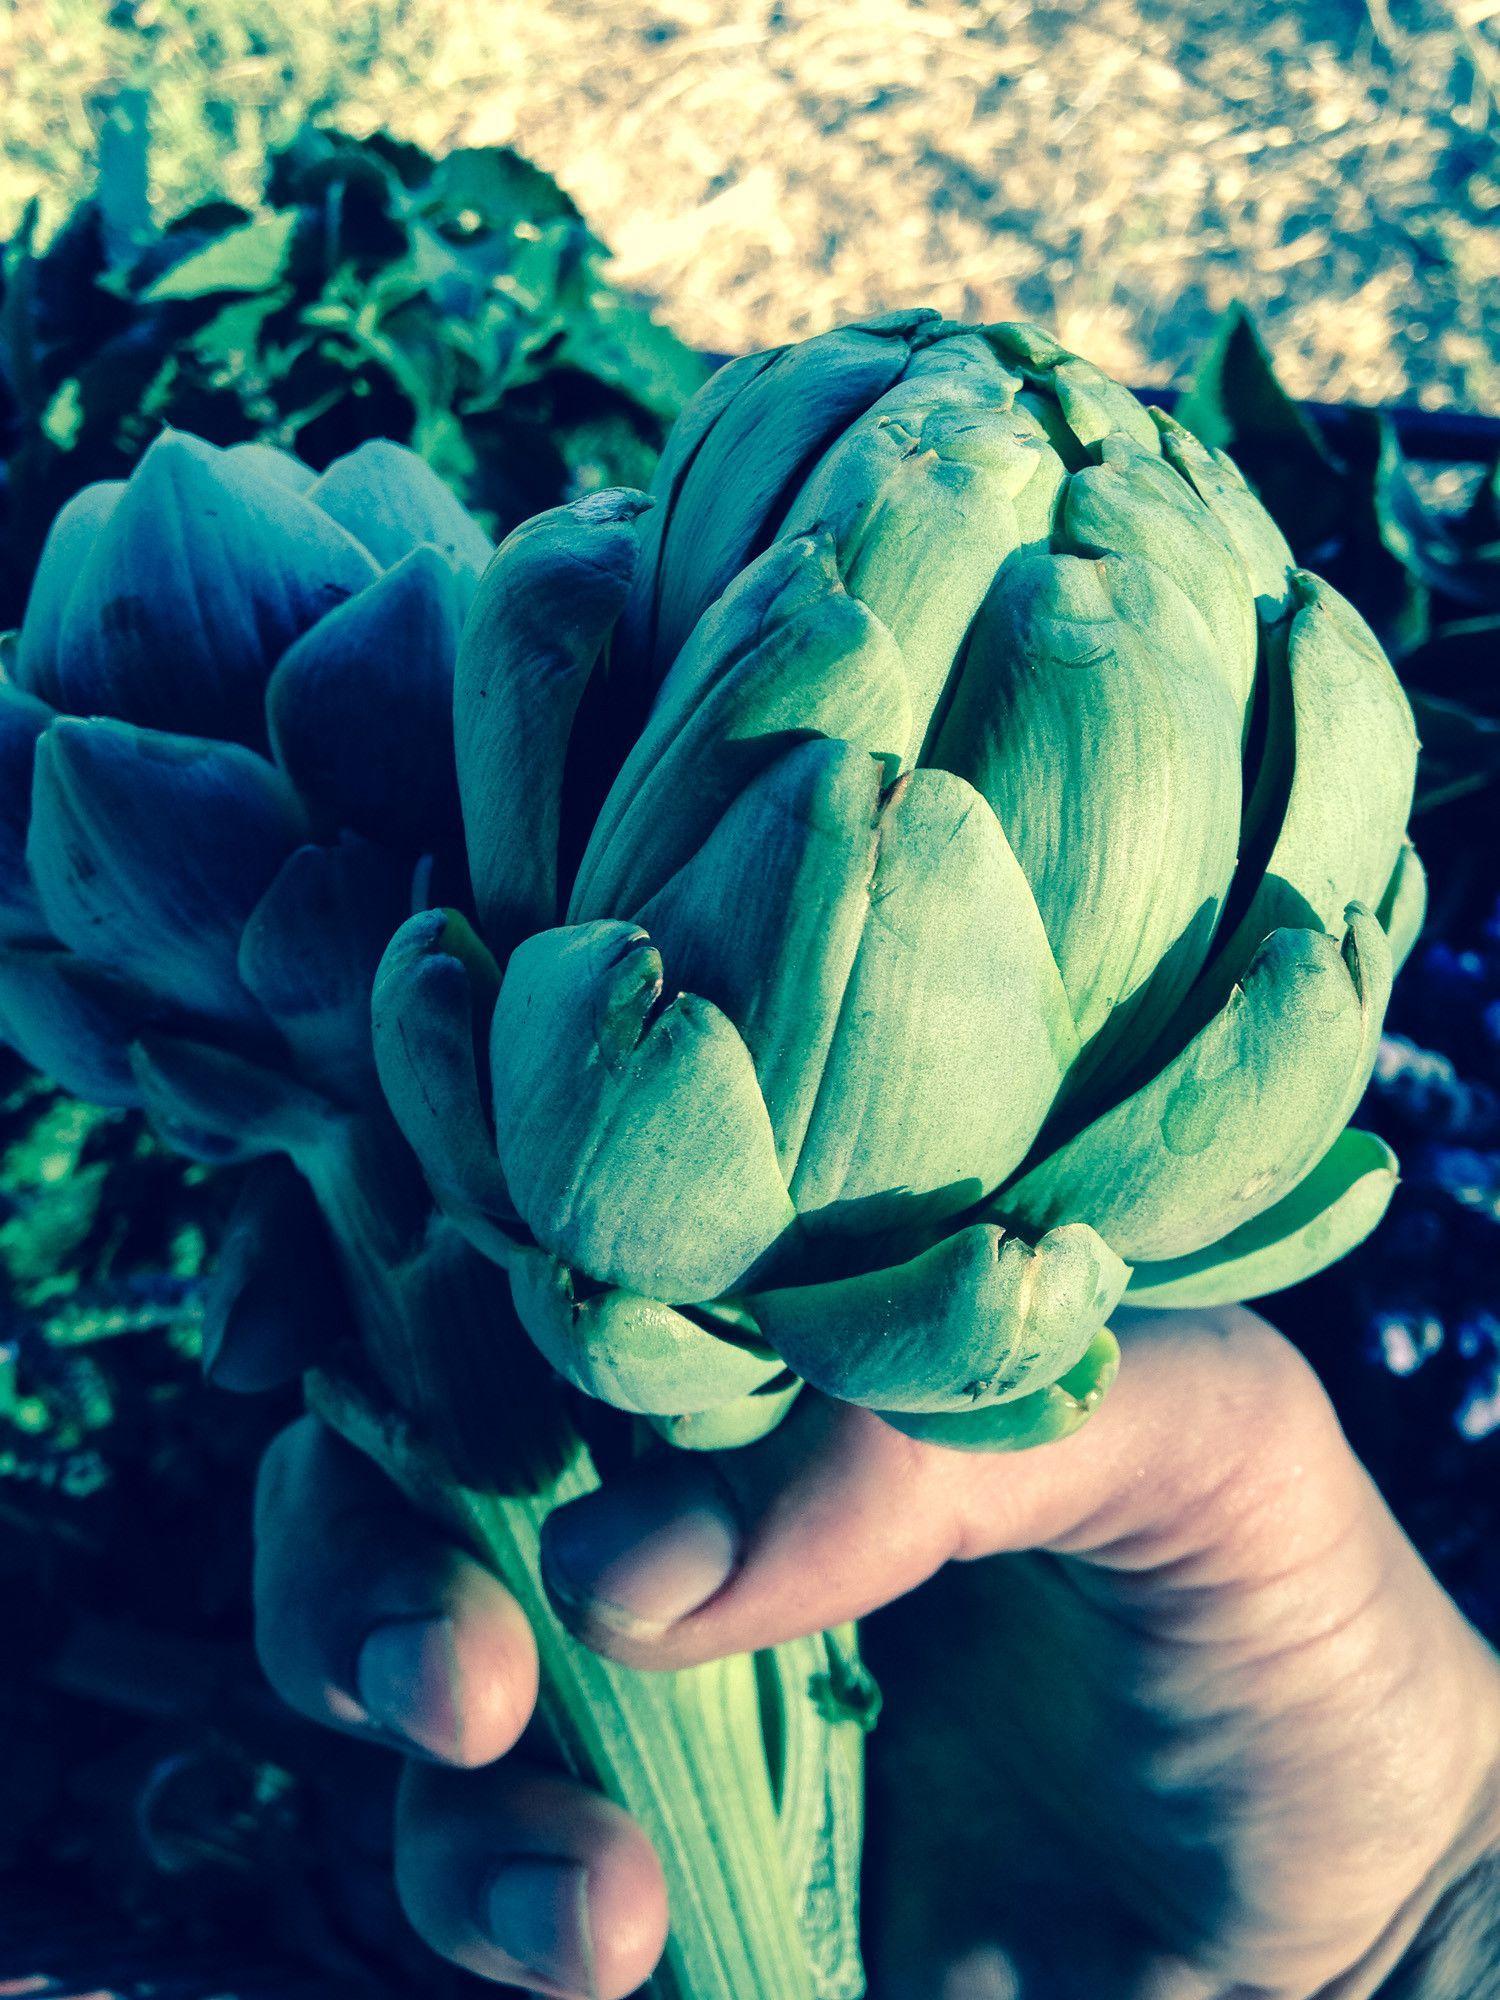 Organic Green Globe Artichoke